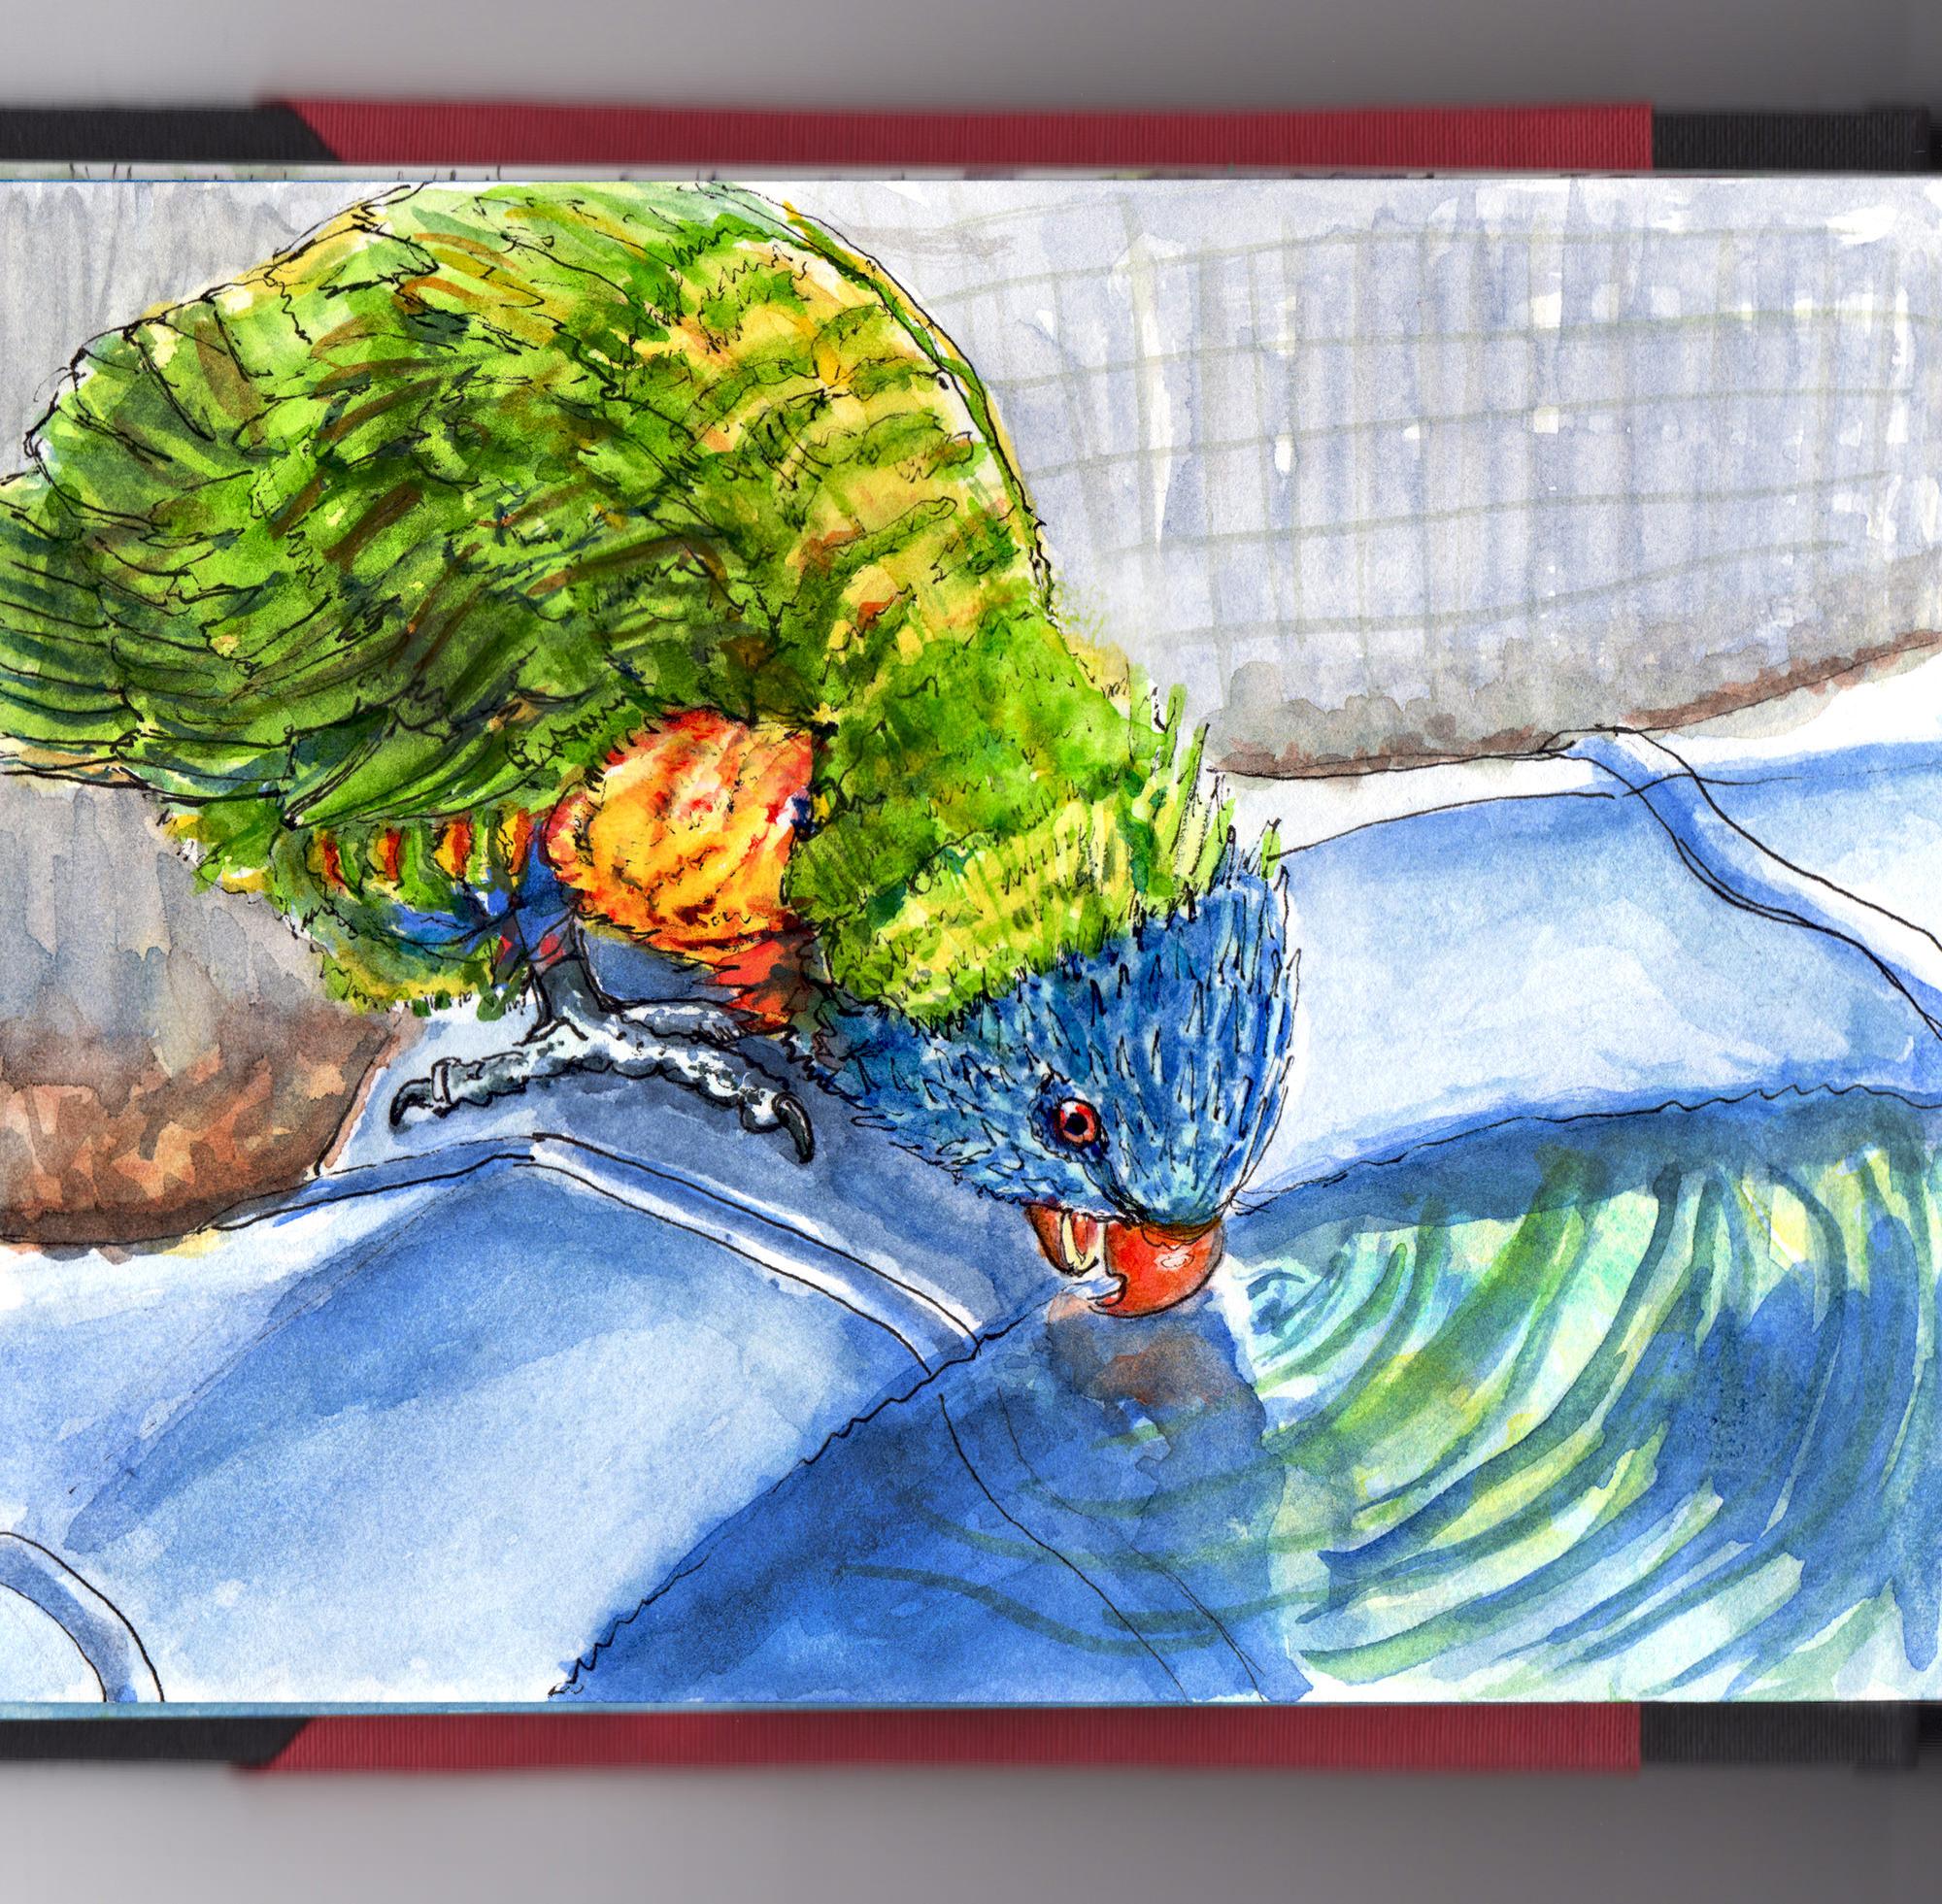 Day 13 - #WorldWatercolorGroup Rainbow Lorikeet Quick Sketch - #doodlewash